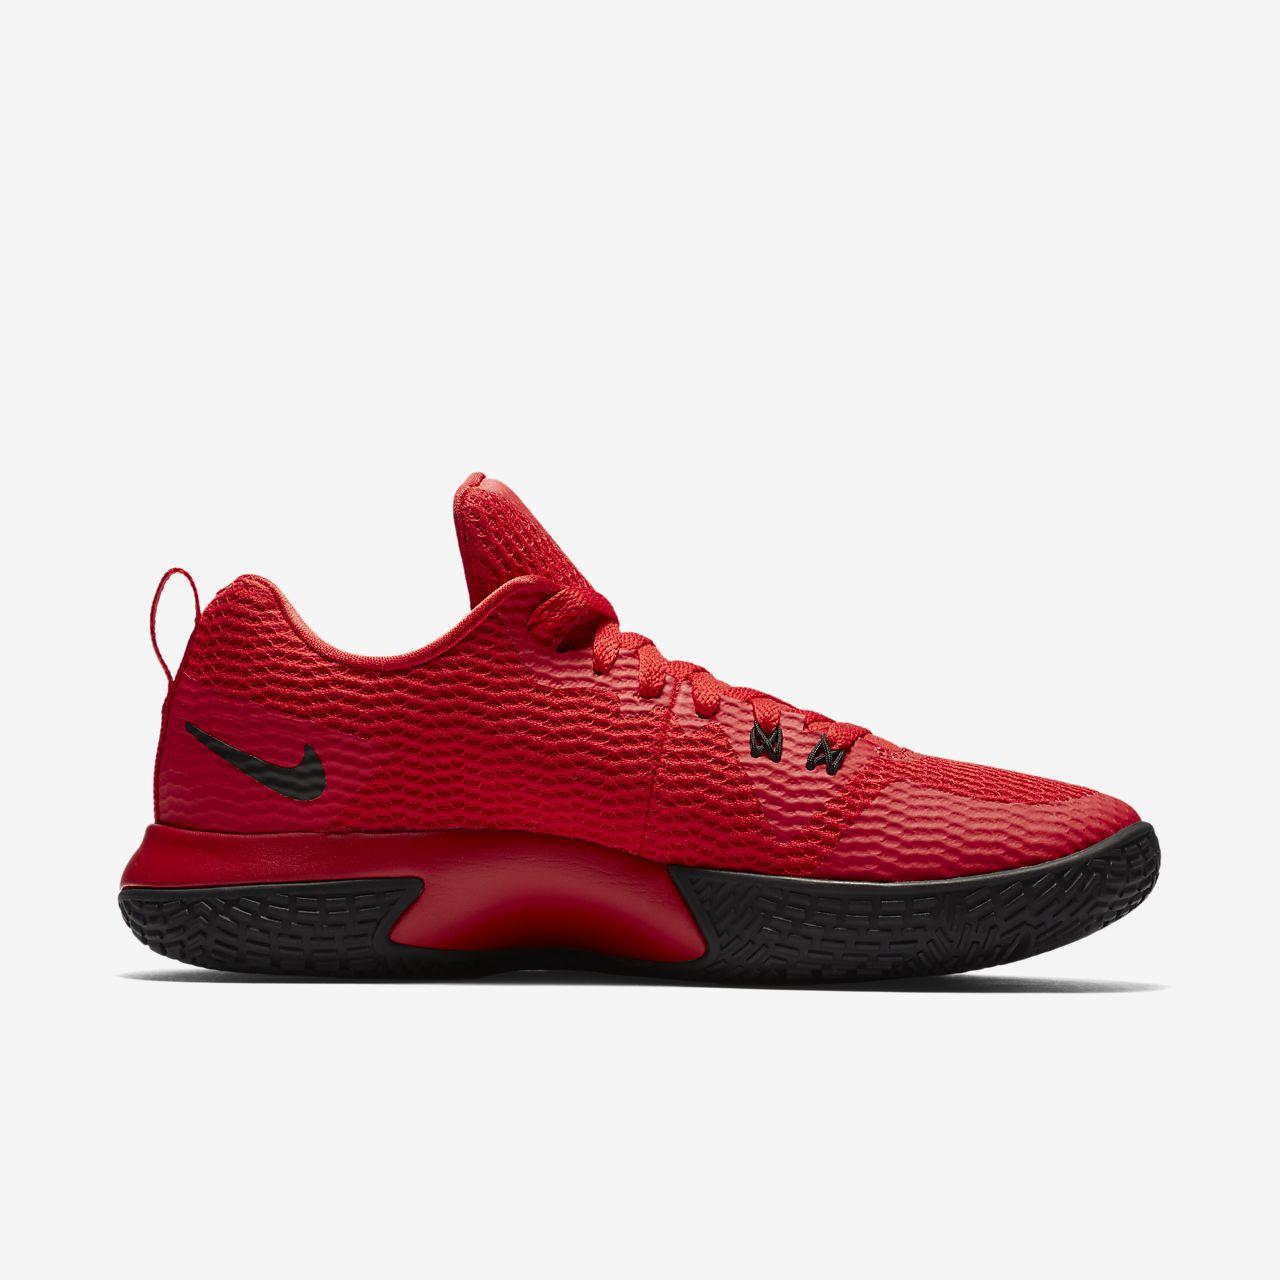 ... Nike Zoom Live II Men's Basketball Shoe